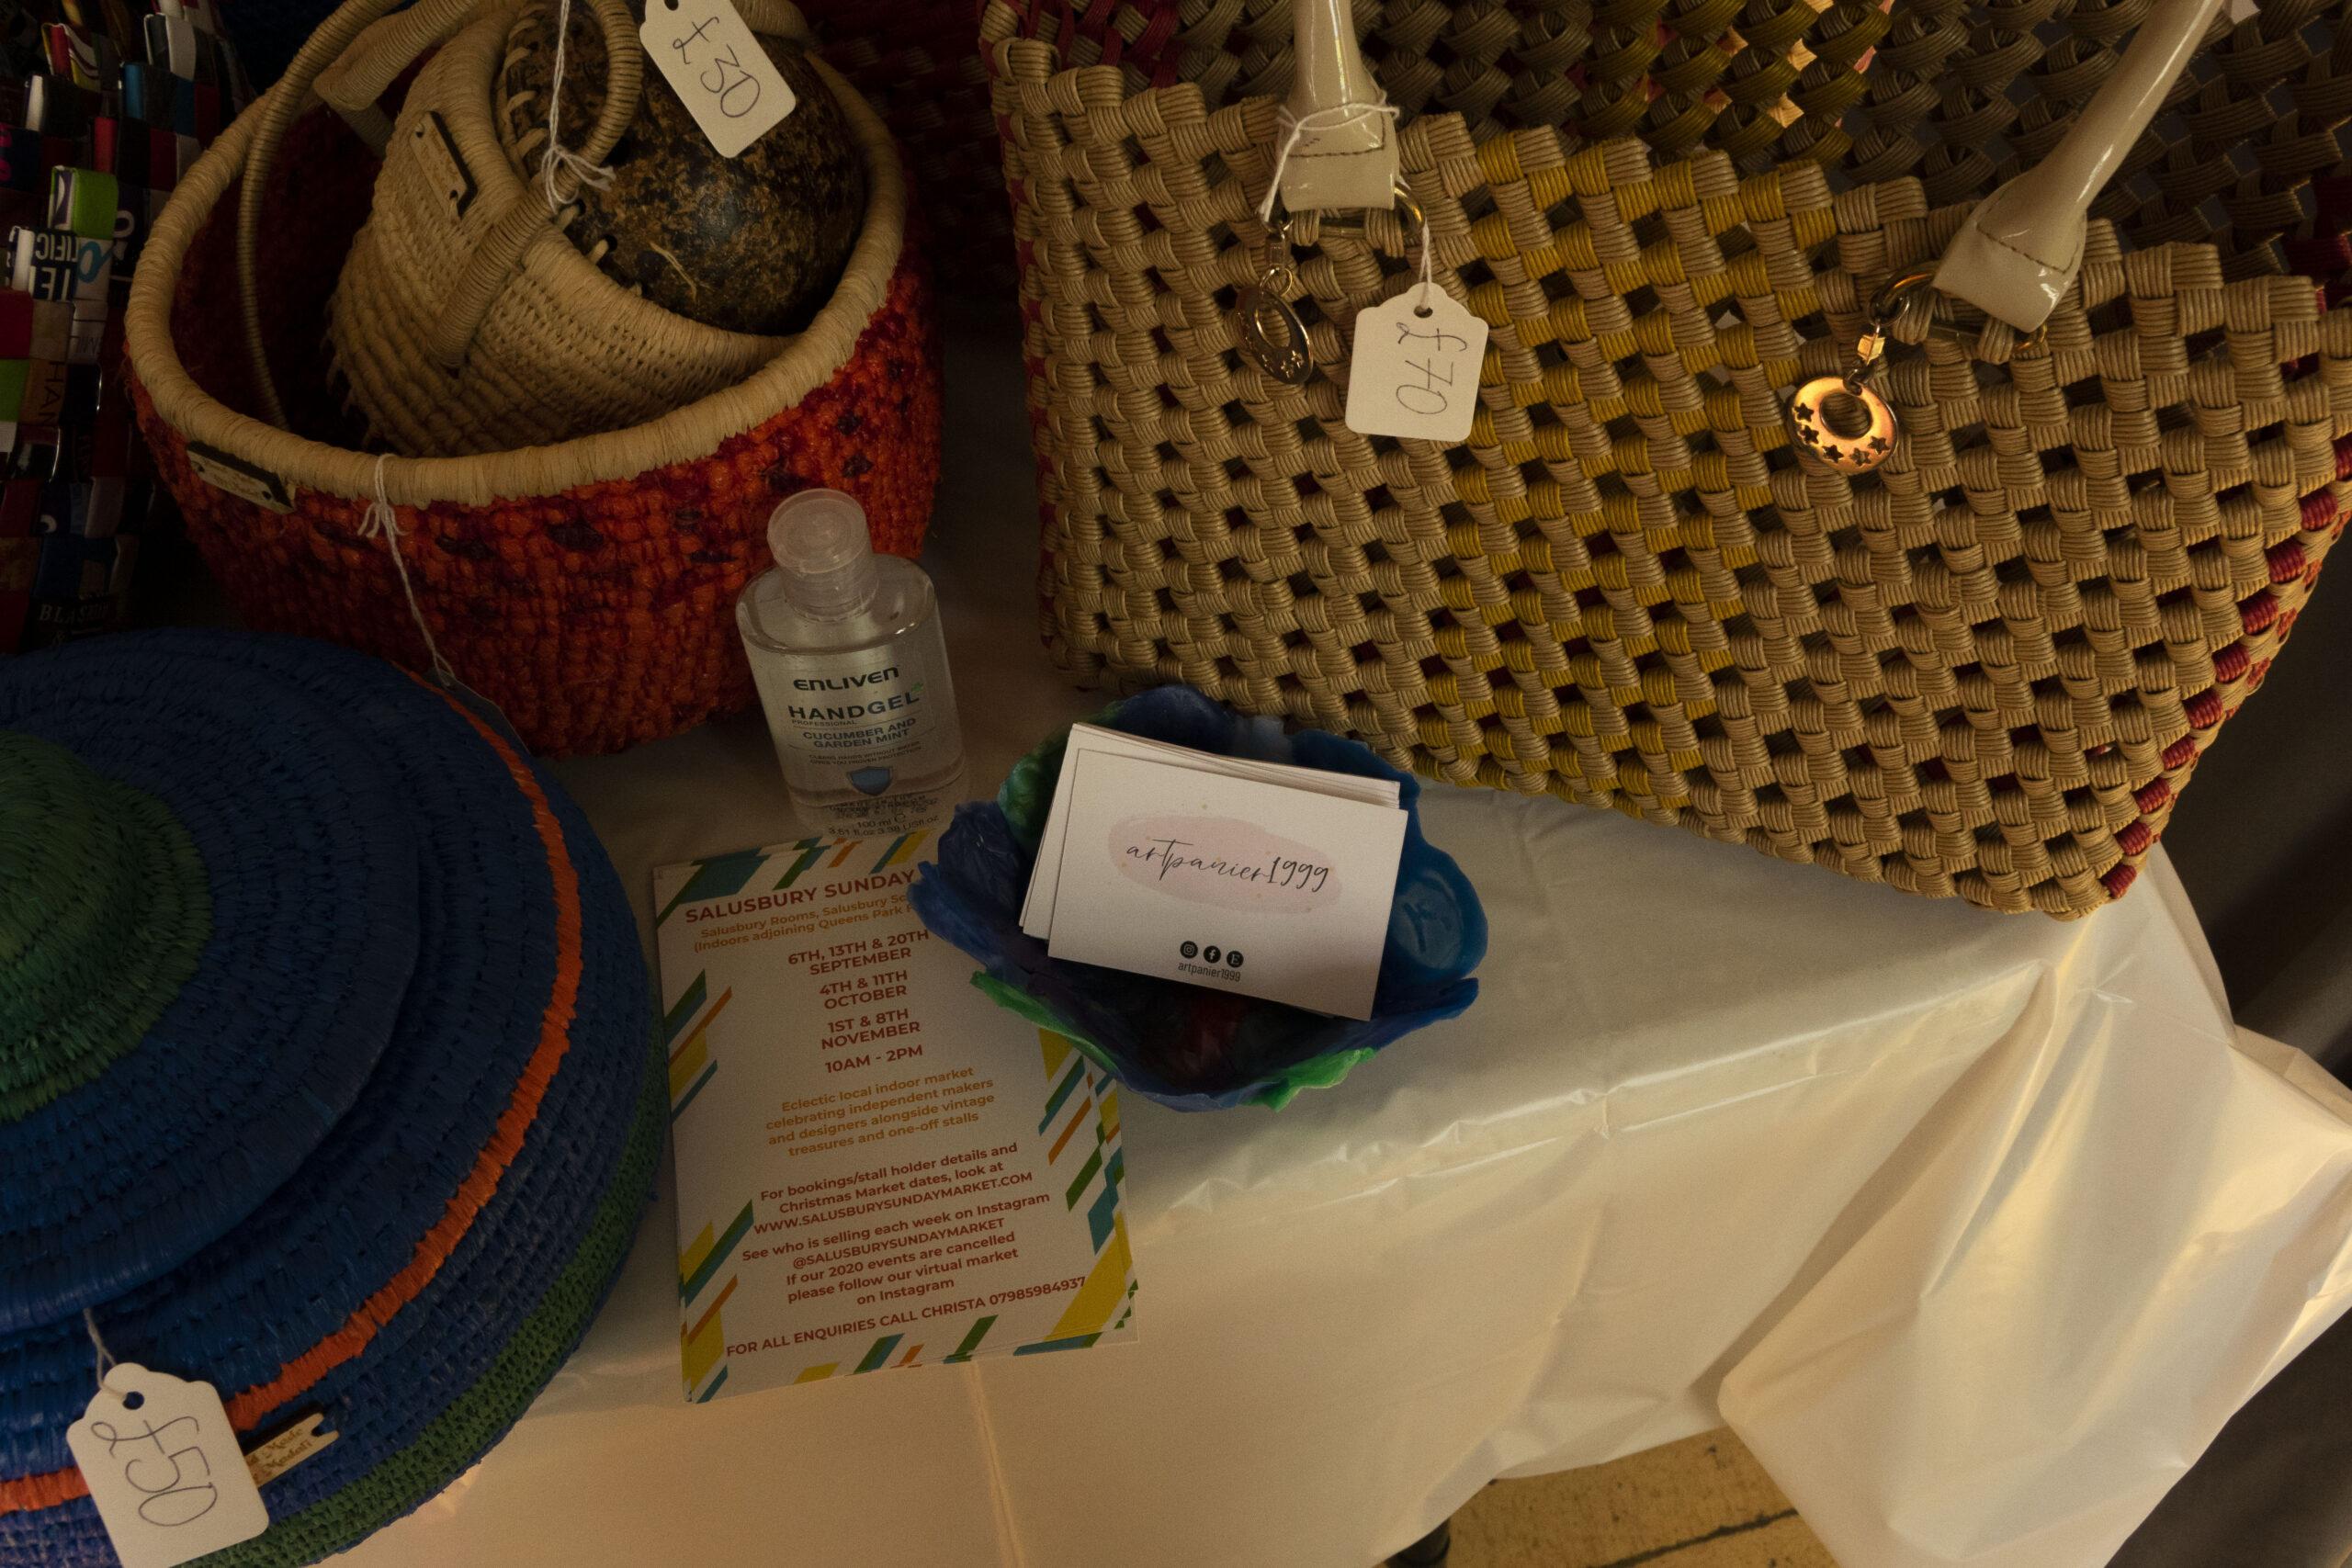 salsbury sunday recyle bag sale